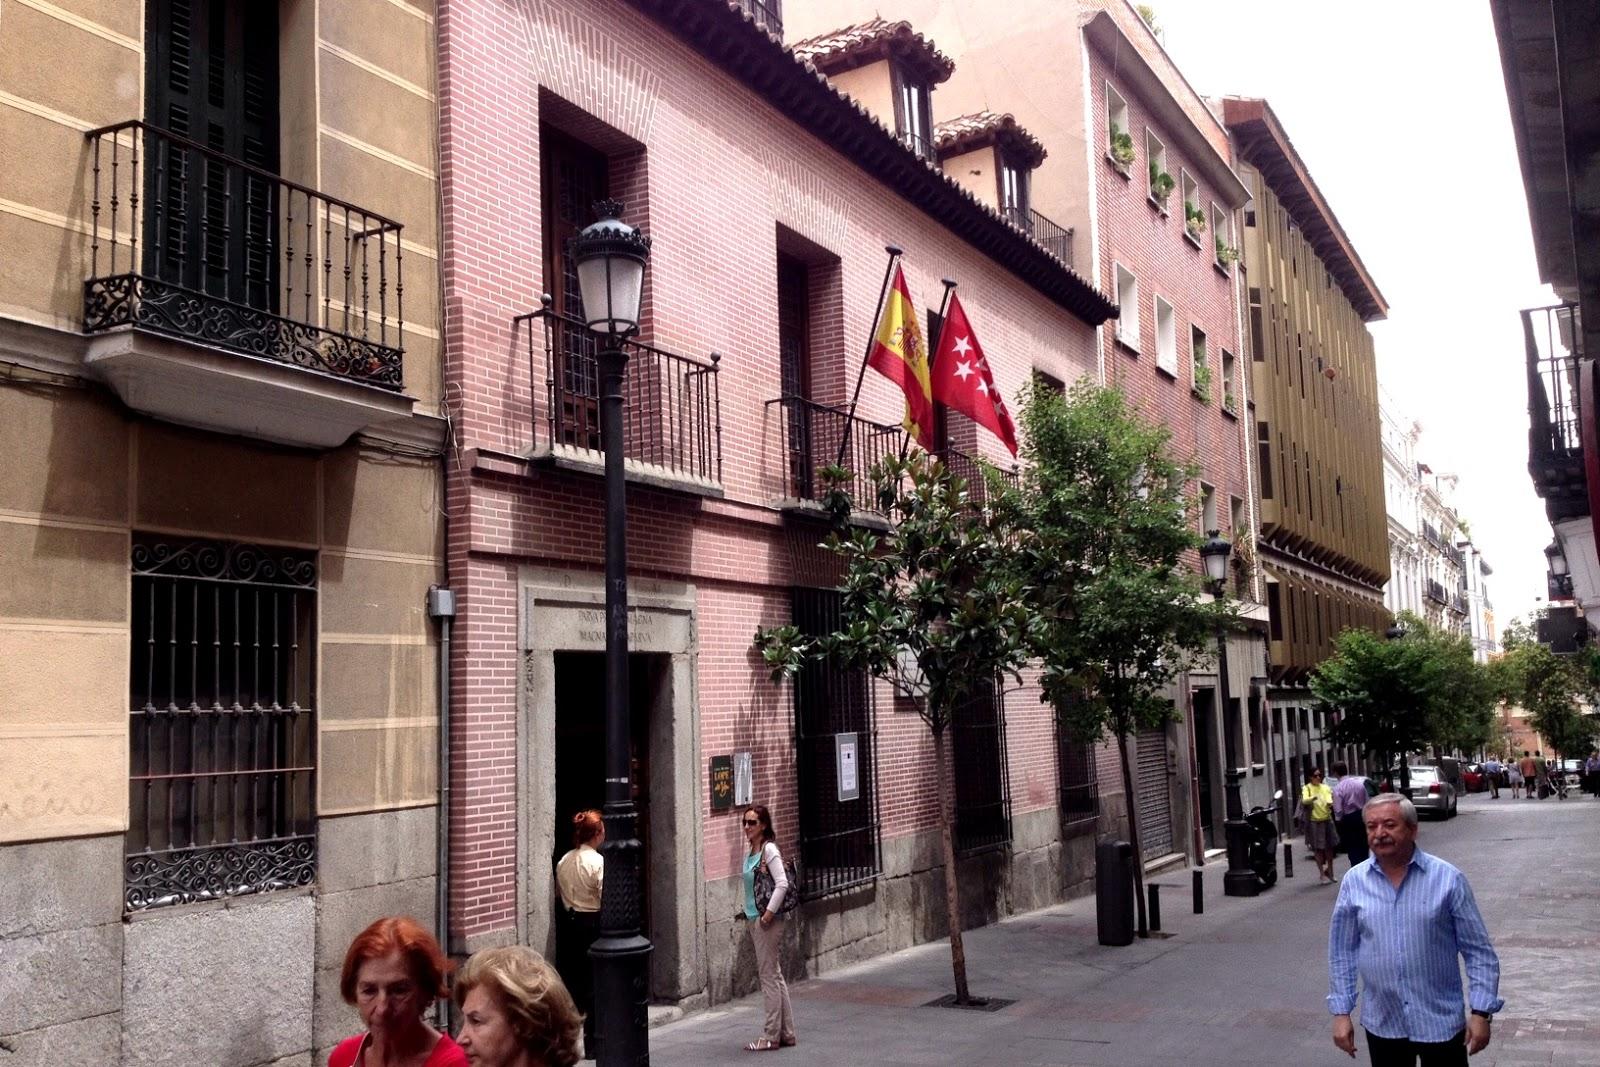 Madrid con arte madrid ins lito casa museo de l pe de vega en pleno centro de la ciudad - Casa vega madrid ...